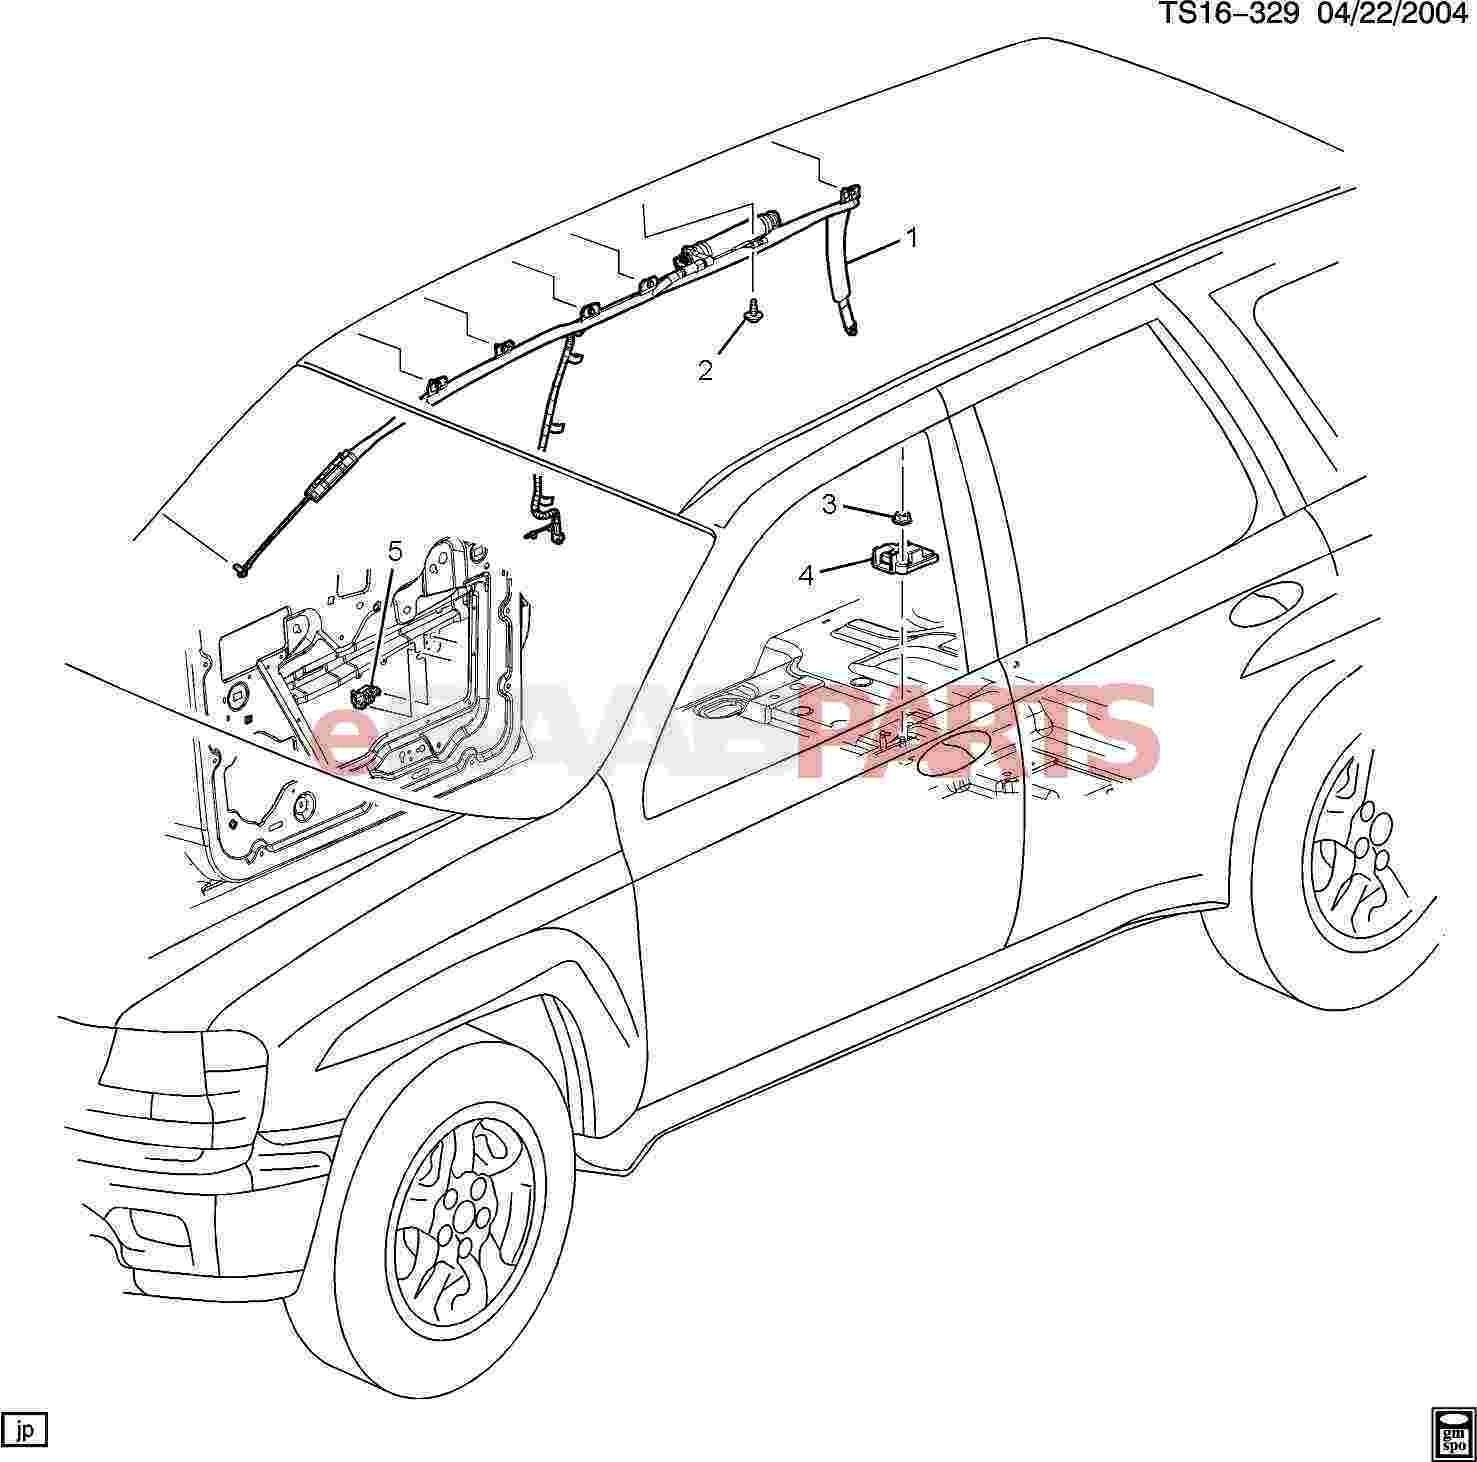 diagram of parts under a car